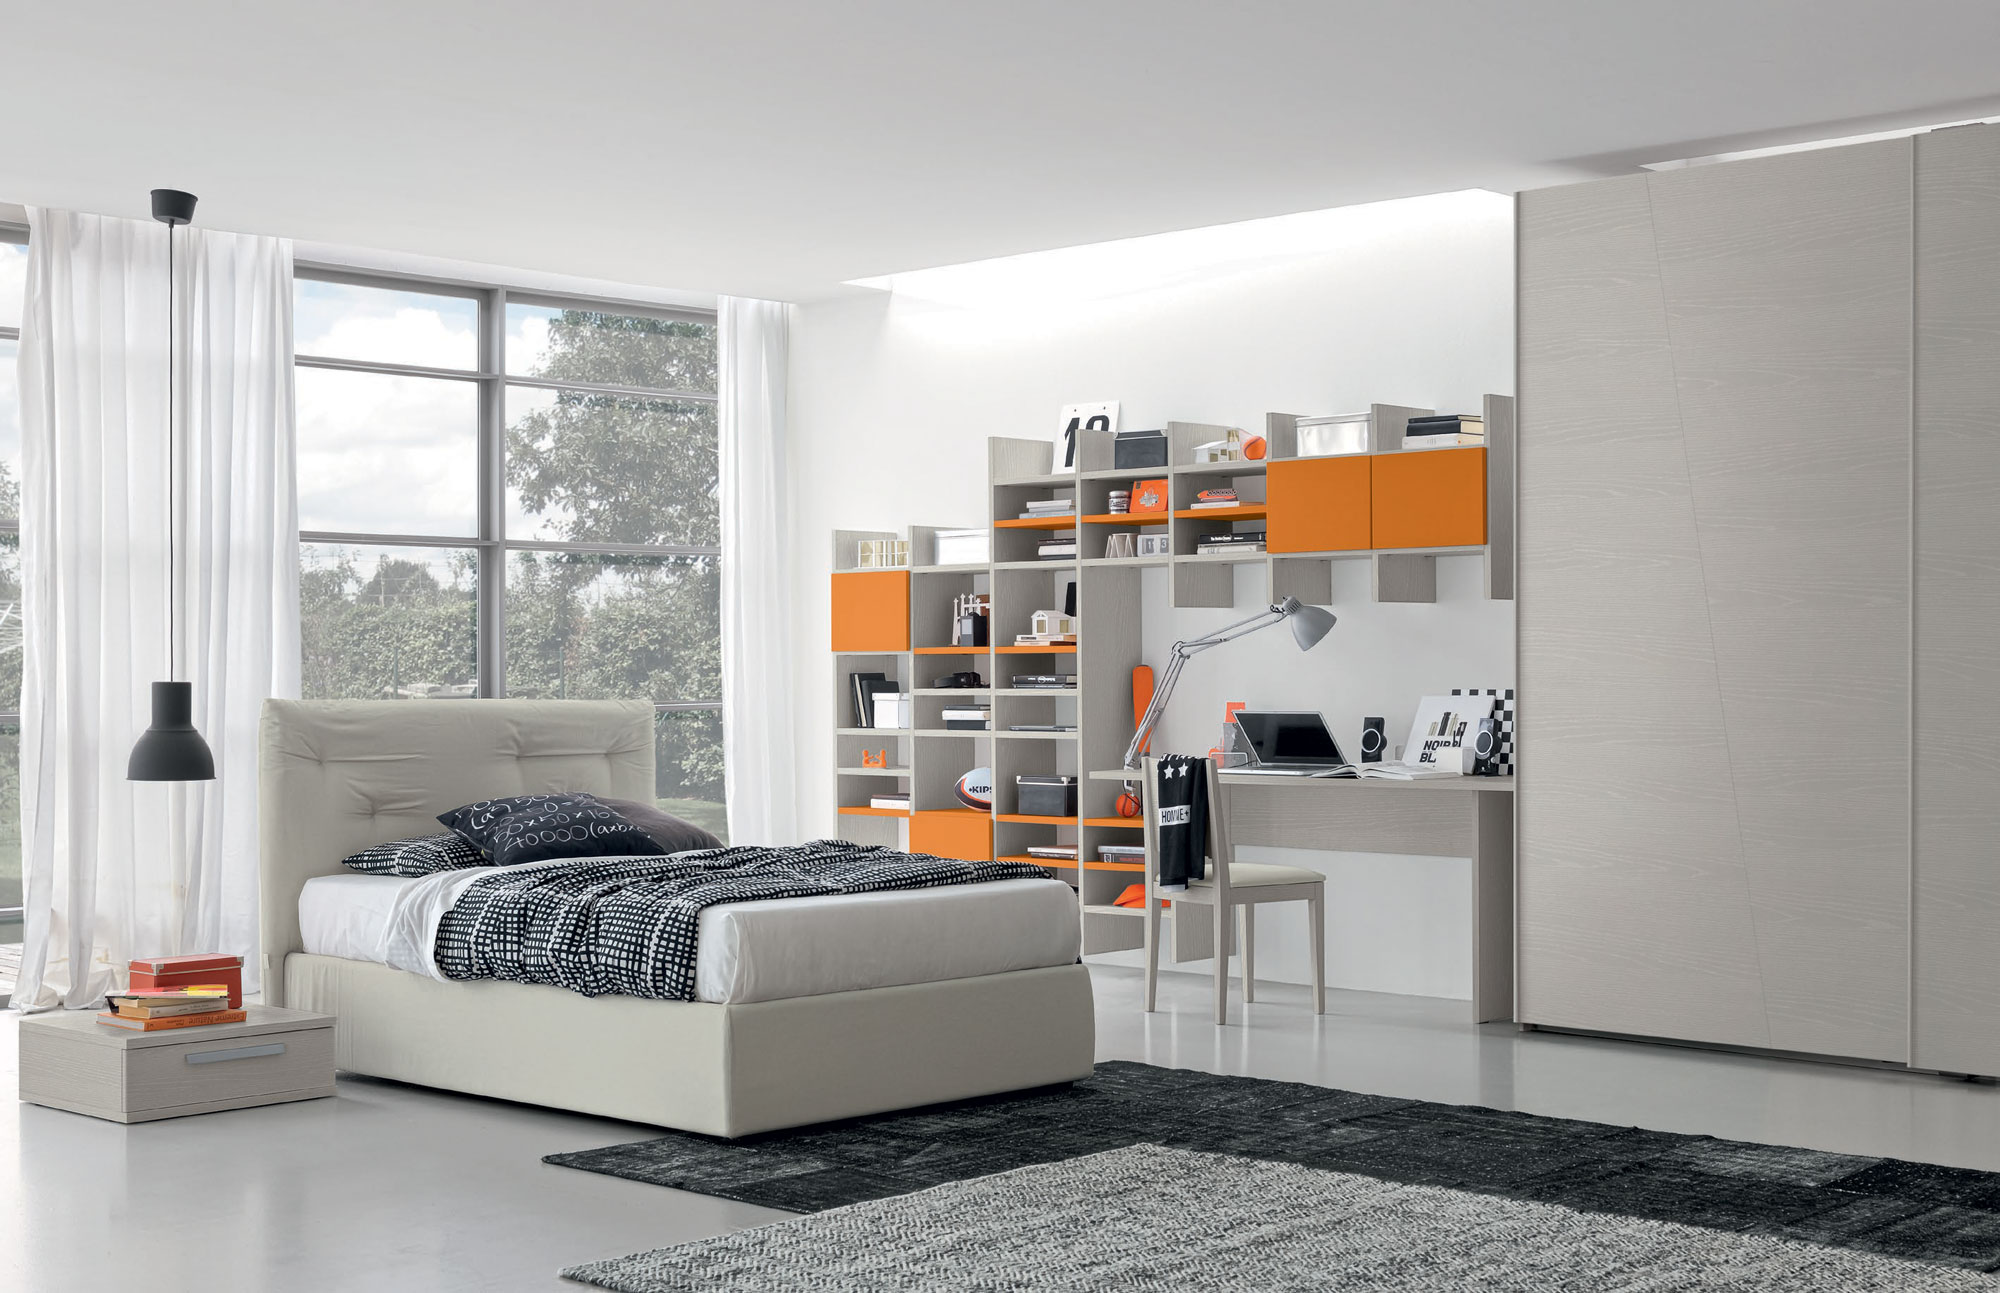 Camerette pirani mobili - Soluzioni per camerette ...